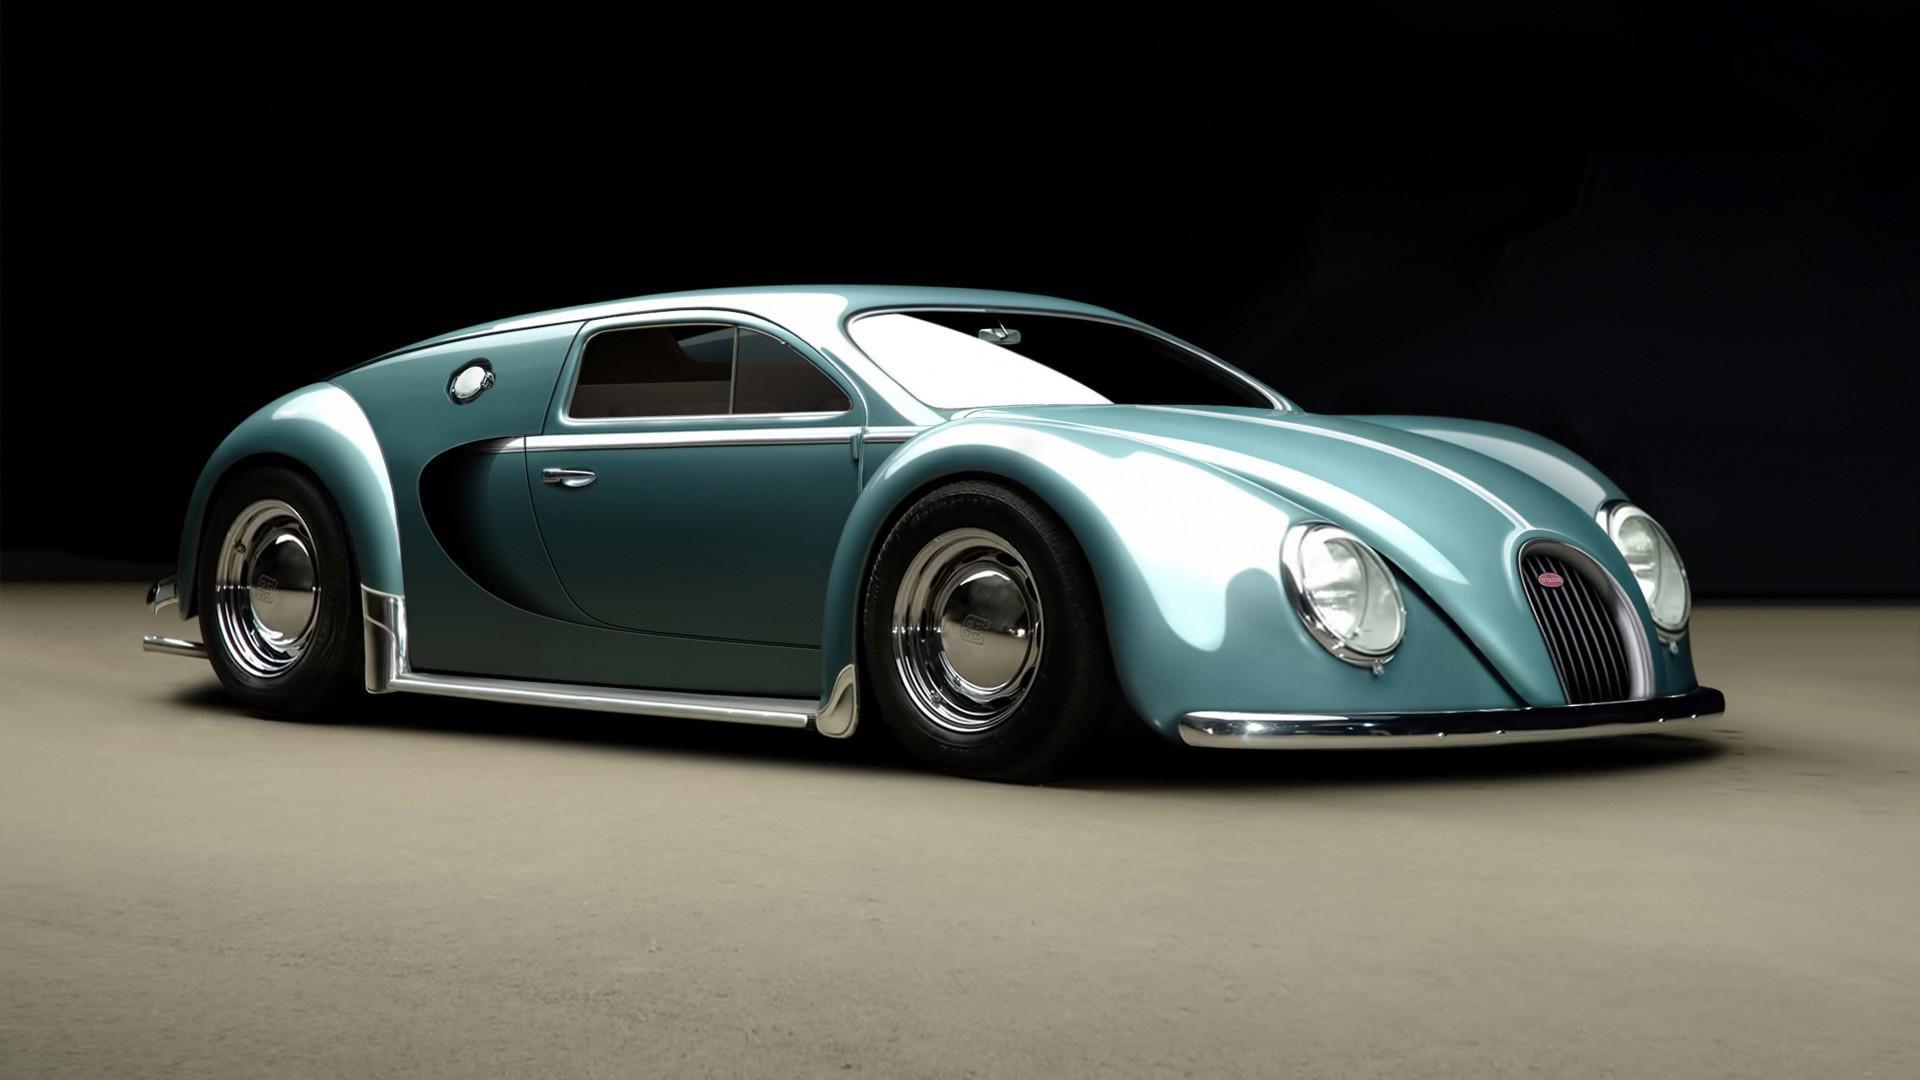 1945 Classic Sport Car Bugatti Veyron